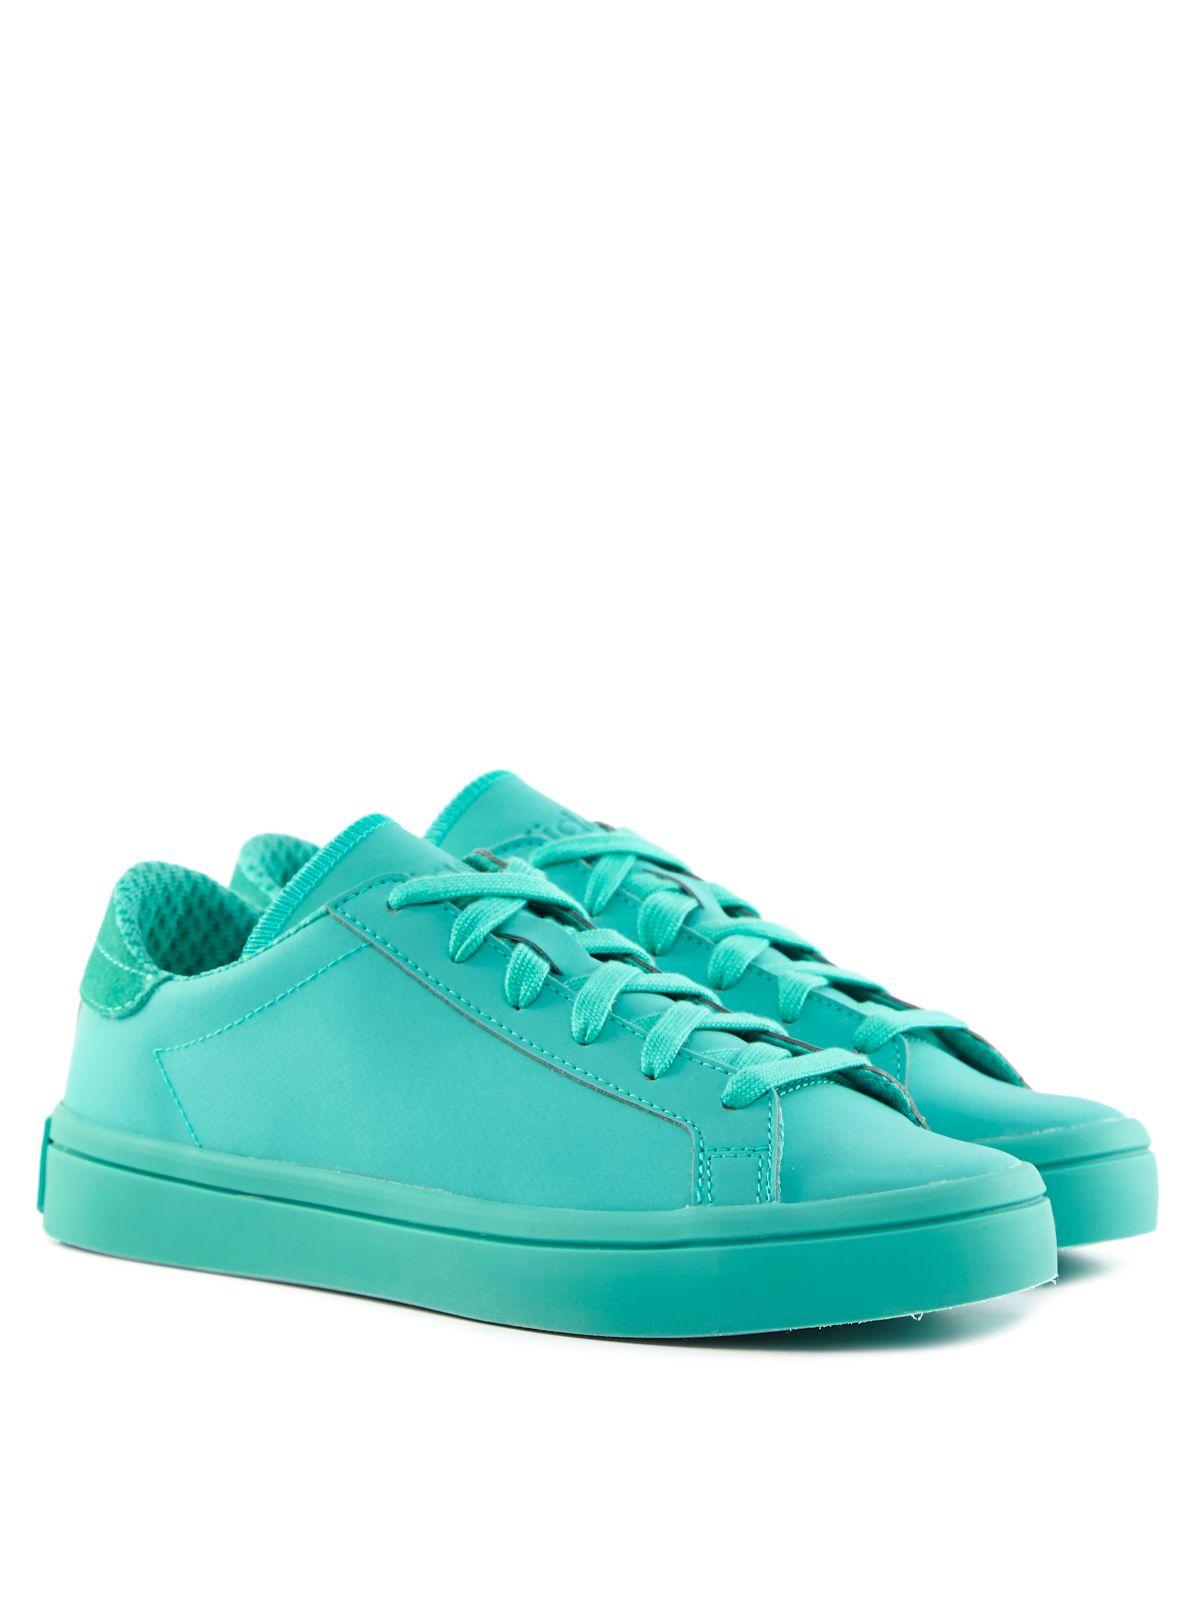 sale retailer 36197 18e24 ADIDAS Court Vantage Adicolor Damen Sneaker